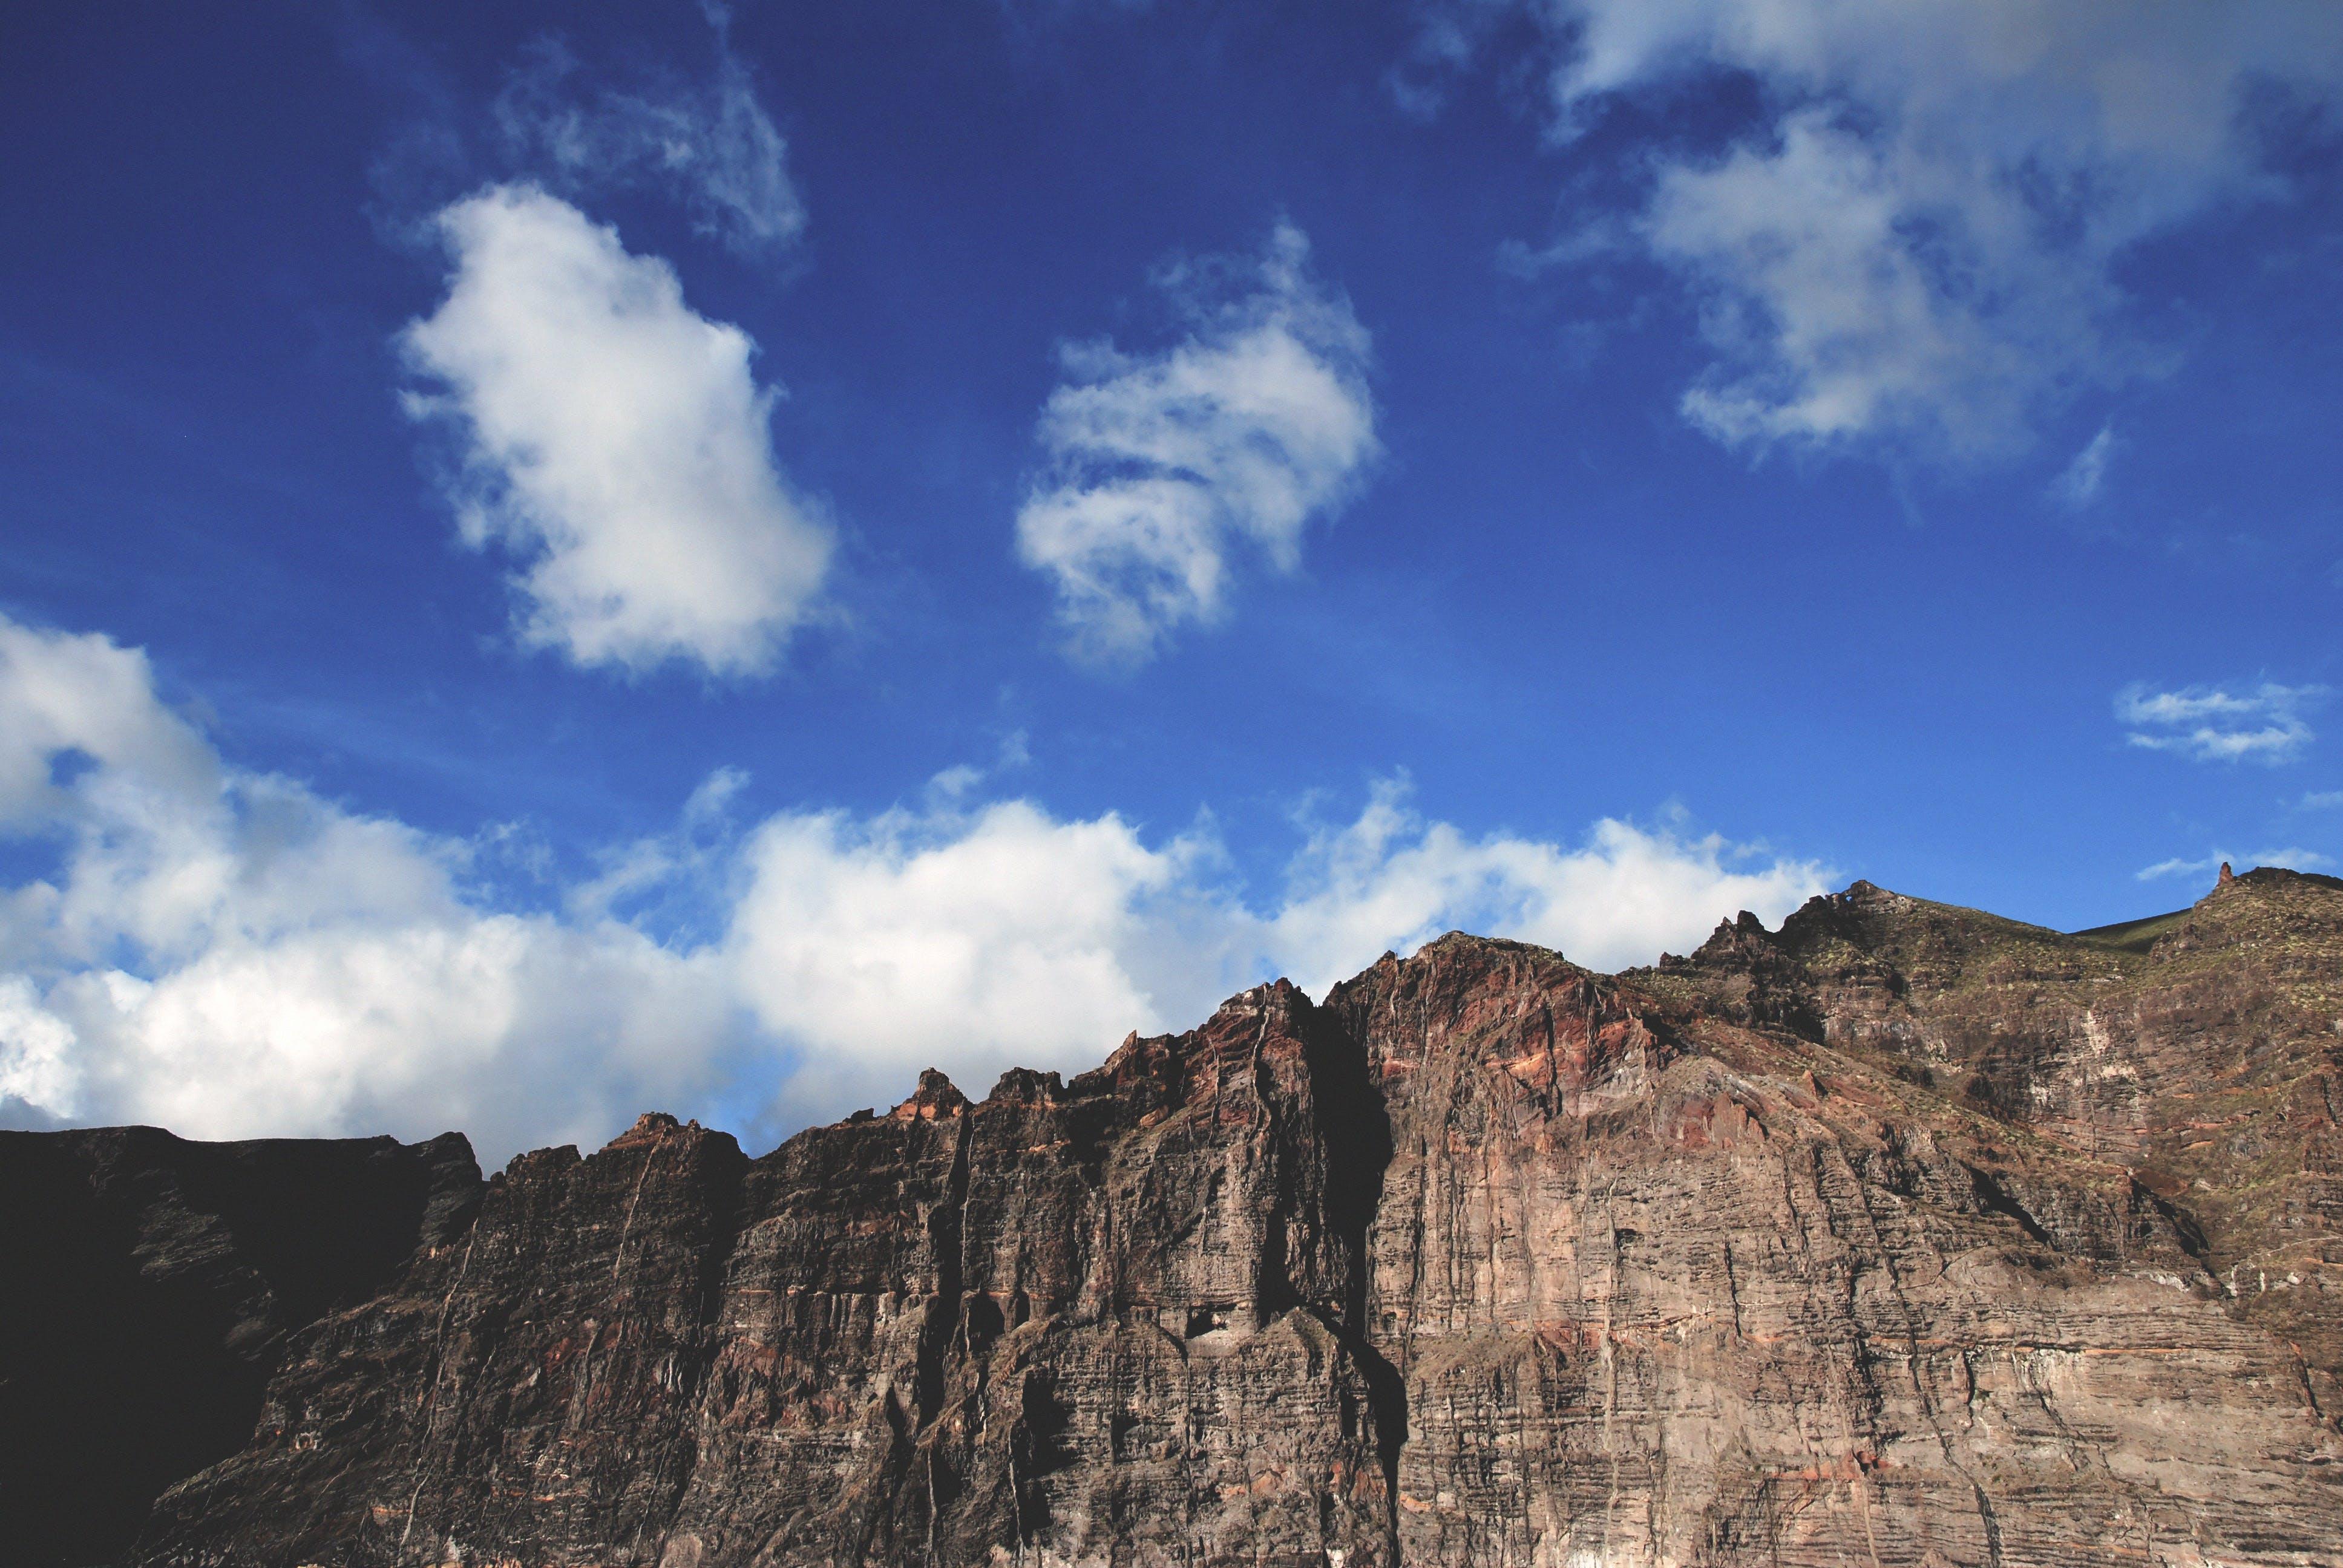 Foto stok gratis alam, awan, bentangan awan, bidikan sudut sempit